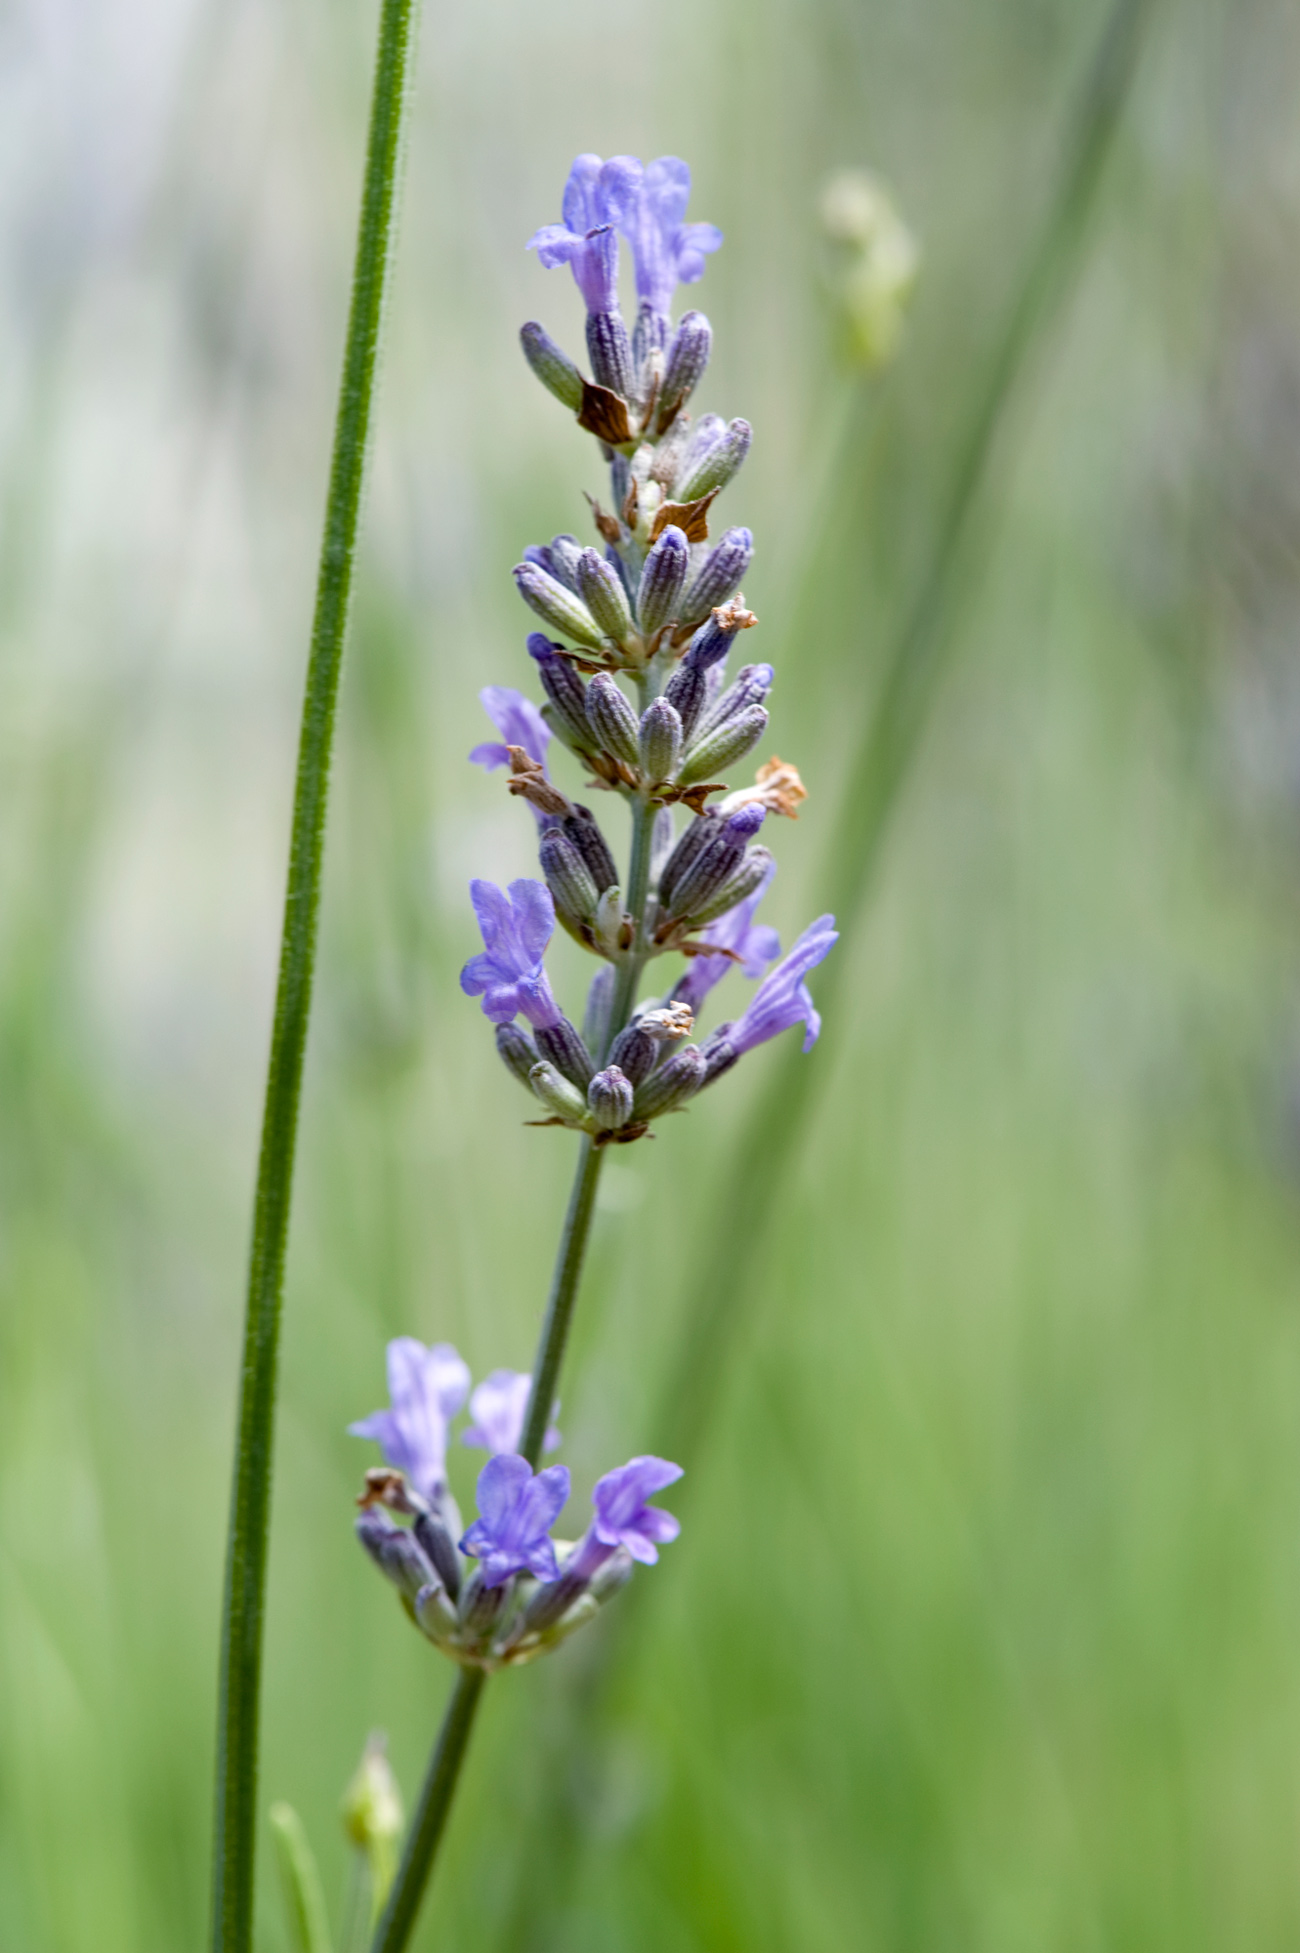 Lavender: Purple buds on a stalk